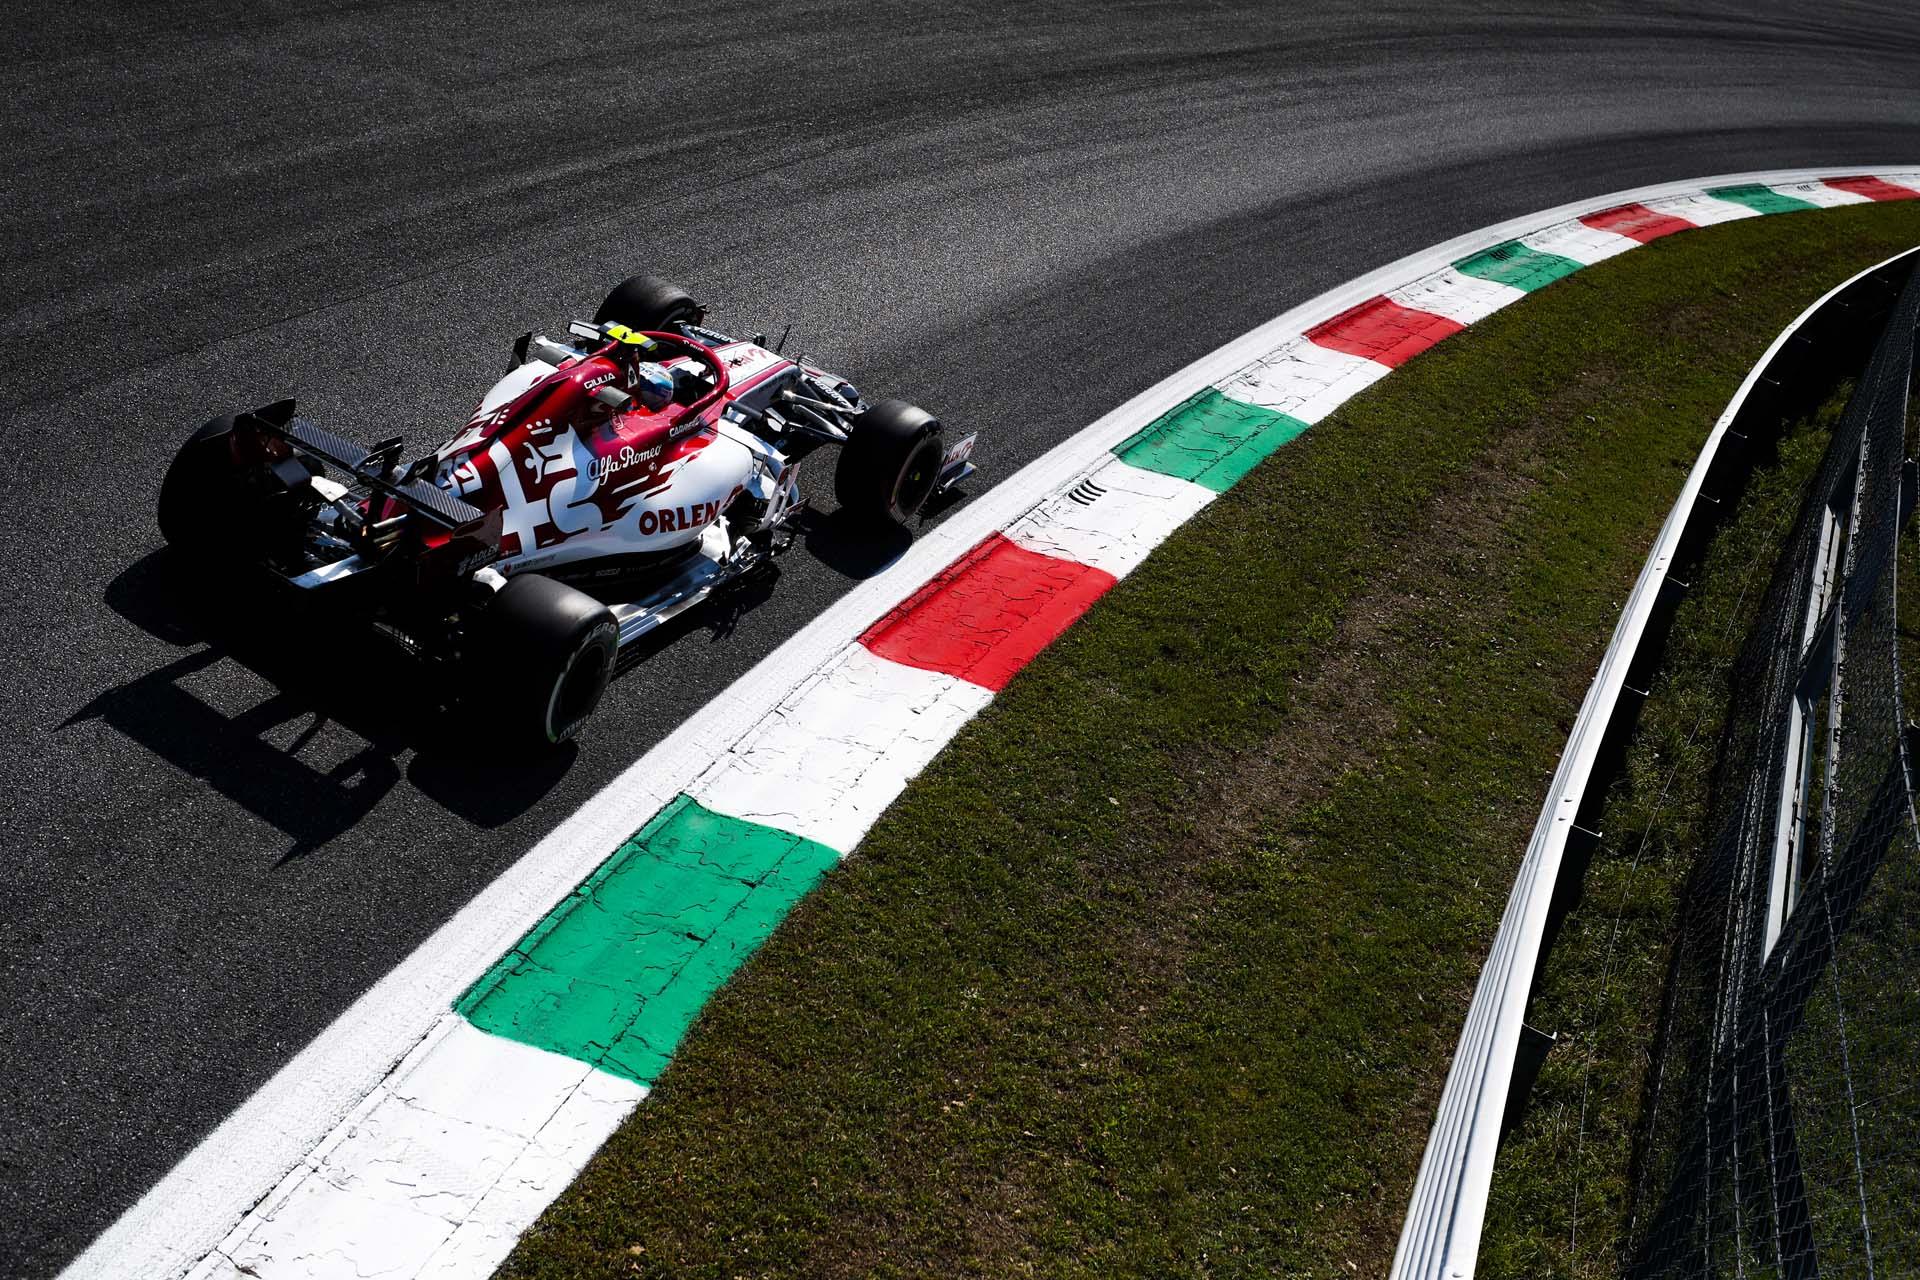 F1 - ITALIAN GRAND PRIX 2020